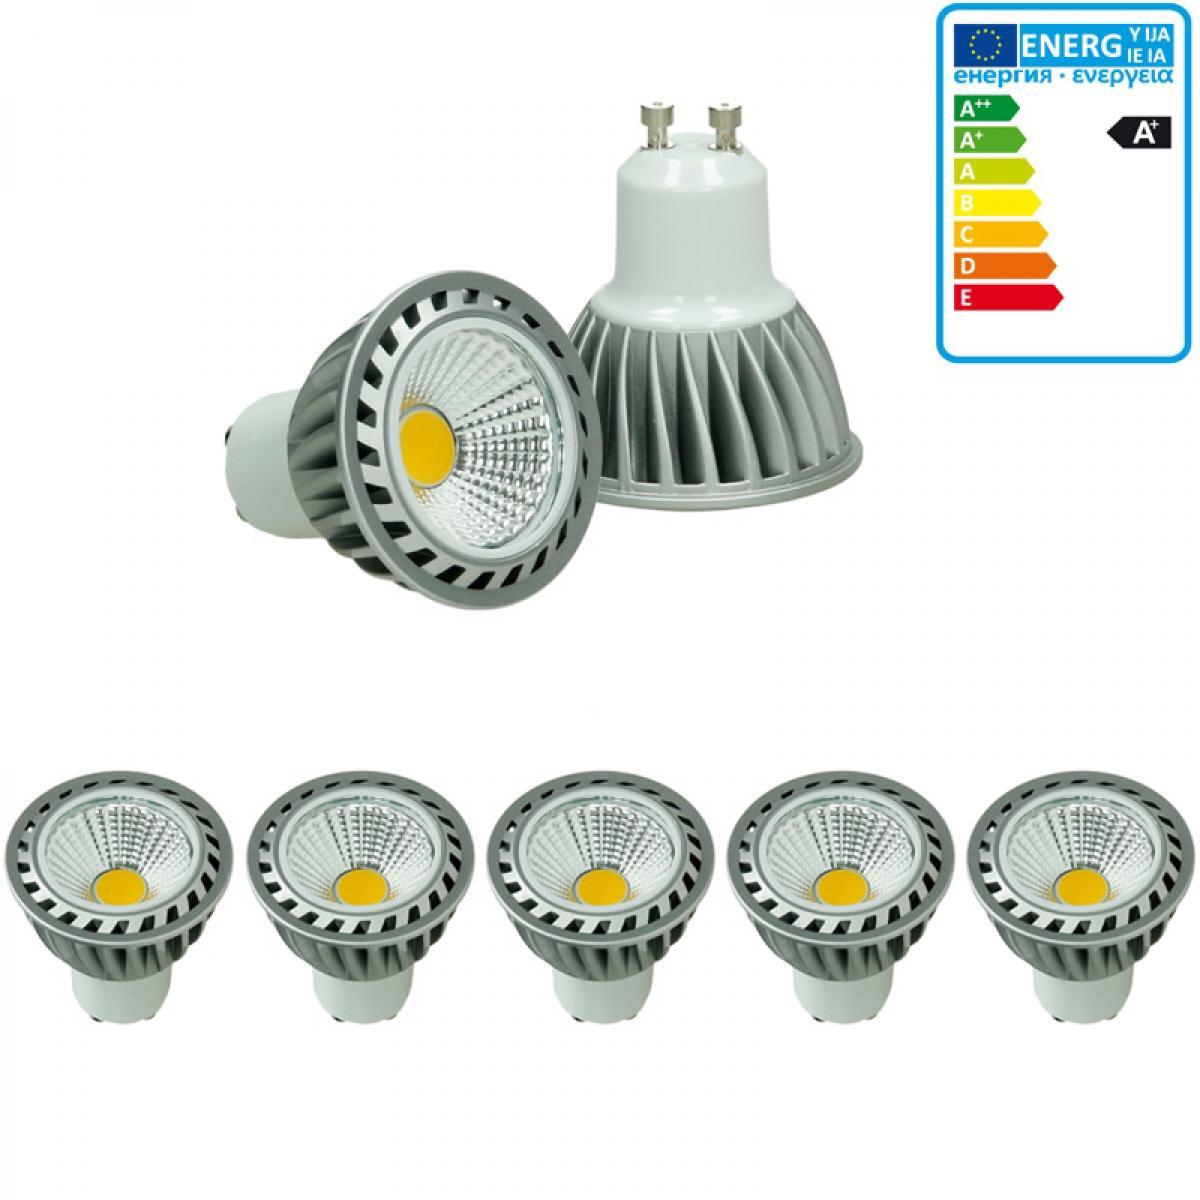 Ecd Germany ECD Germany 5 Pack 4W GU10 LED Spot remplace 20W Halogène 220-240V 60 ° Angle de faisceau 243 Lumens 2800K Chaud Blanc A